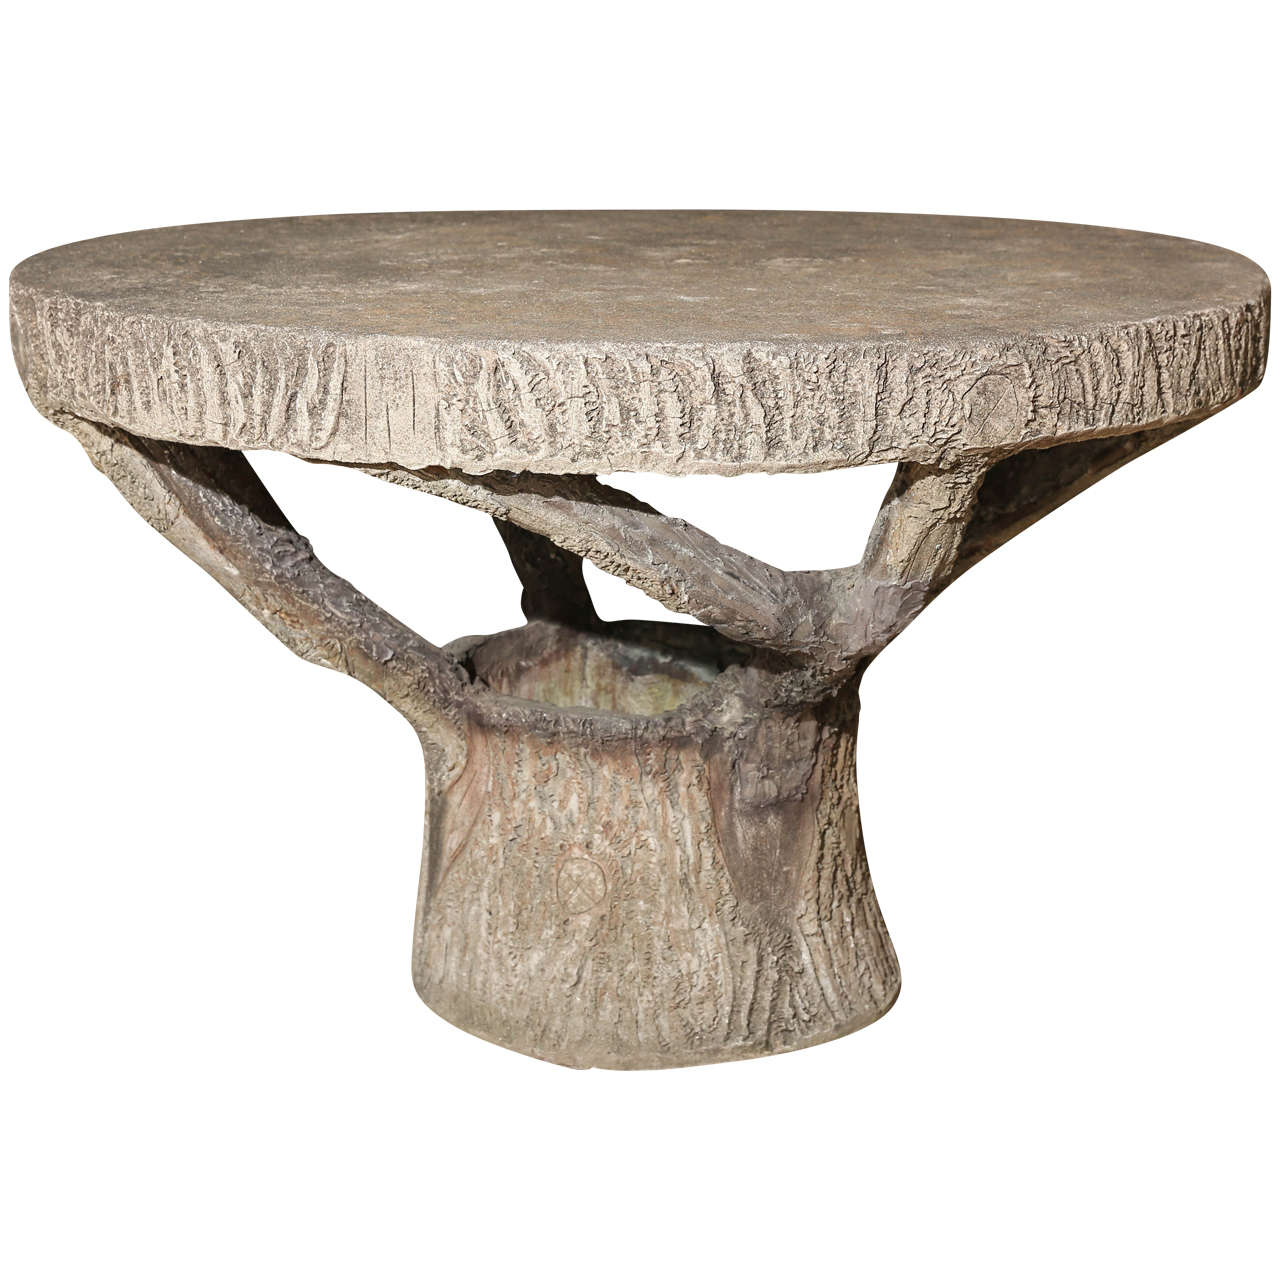 Vintage Round Faux Bois Table For Sale